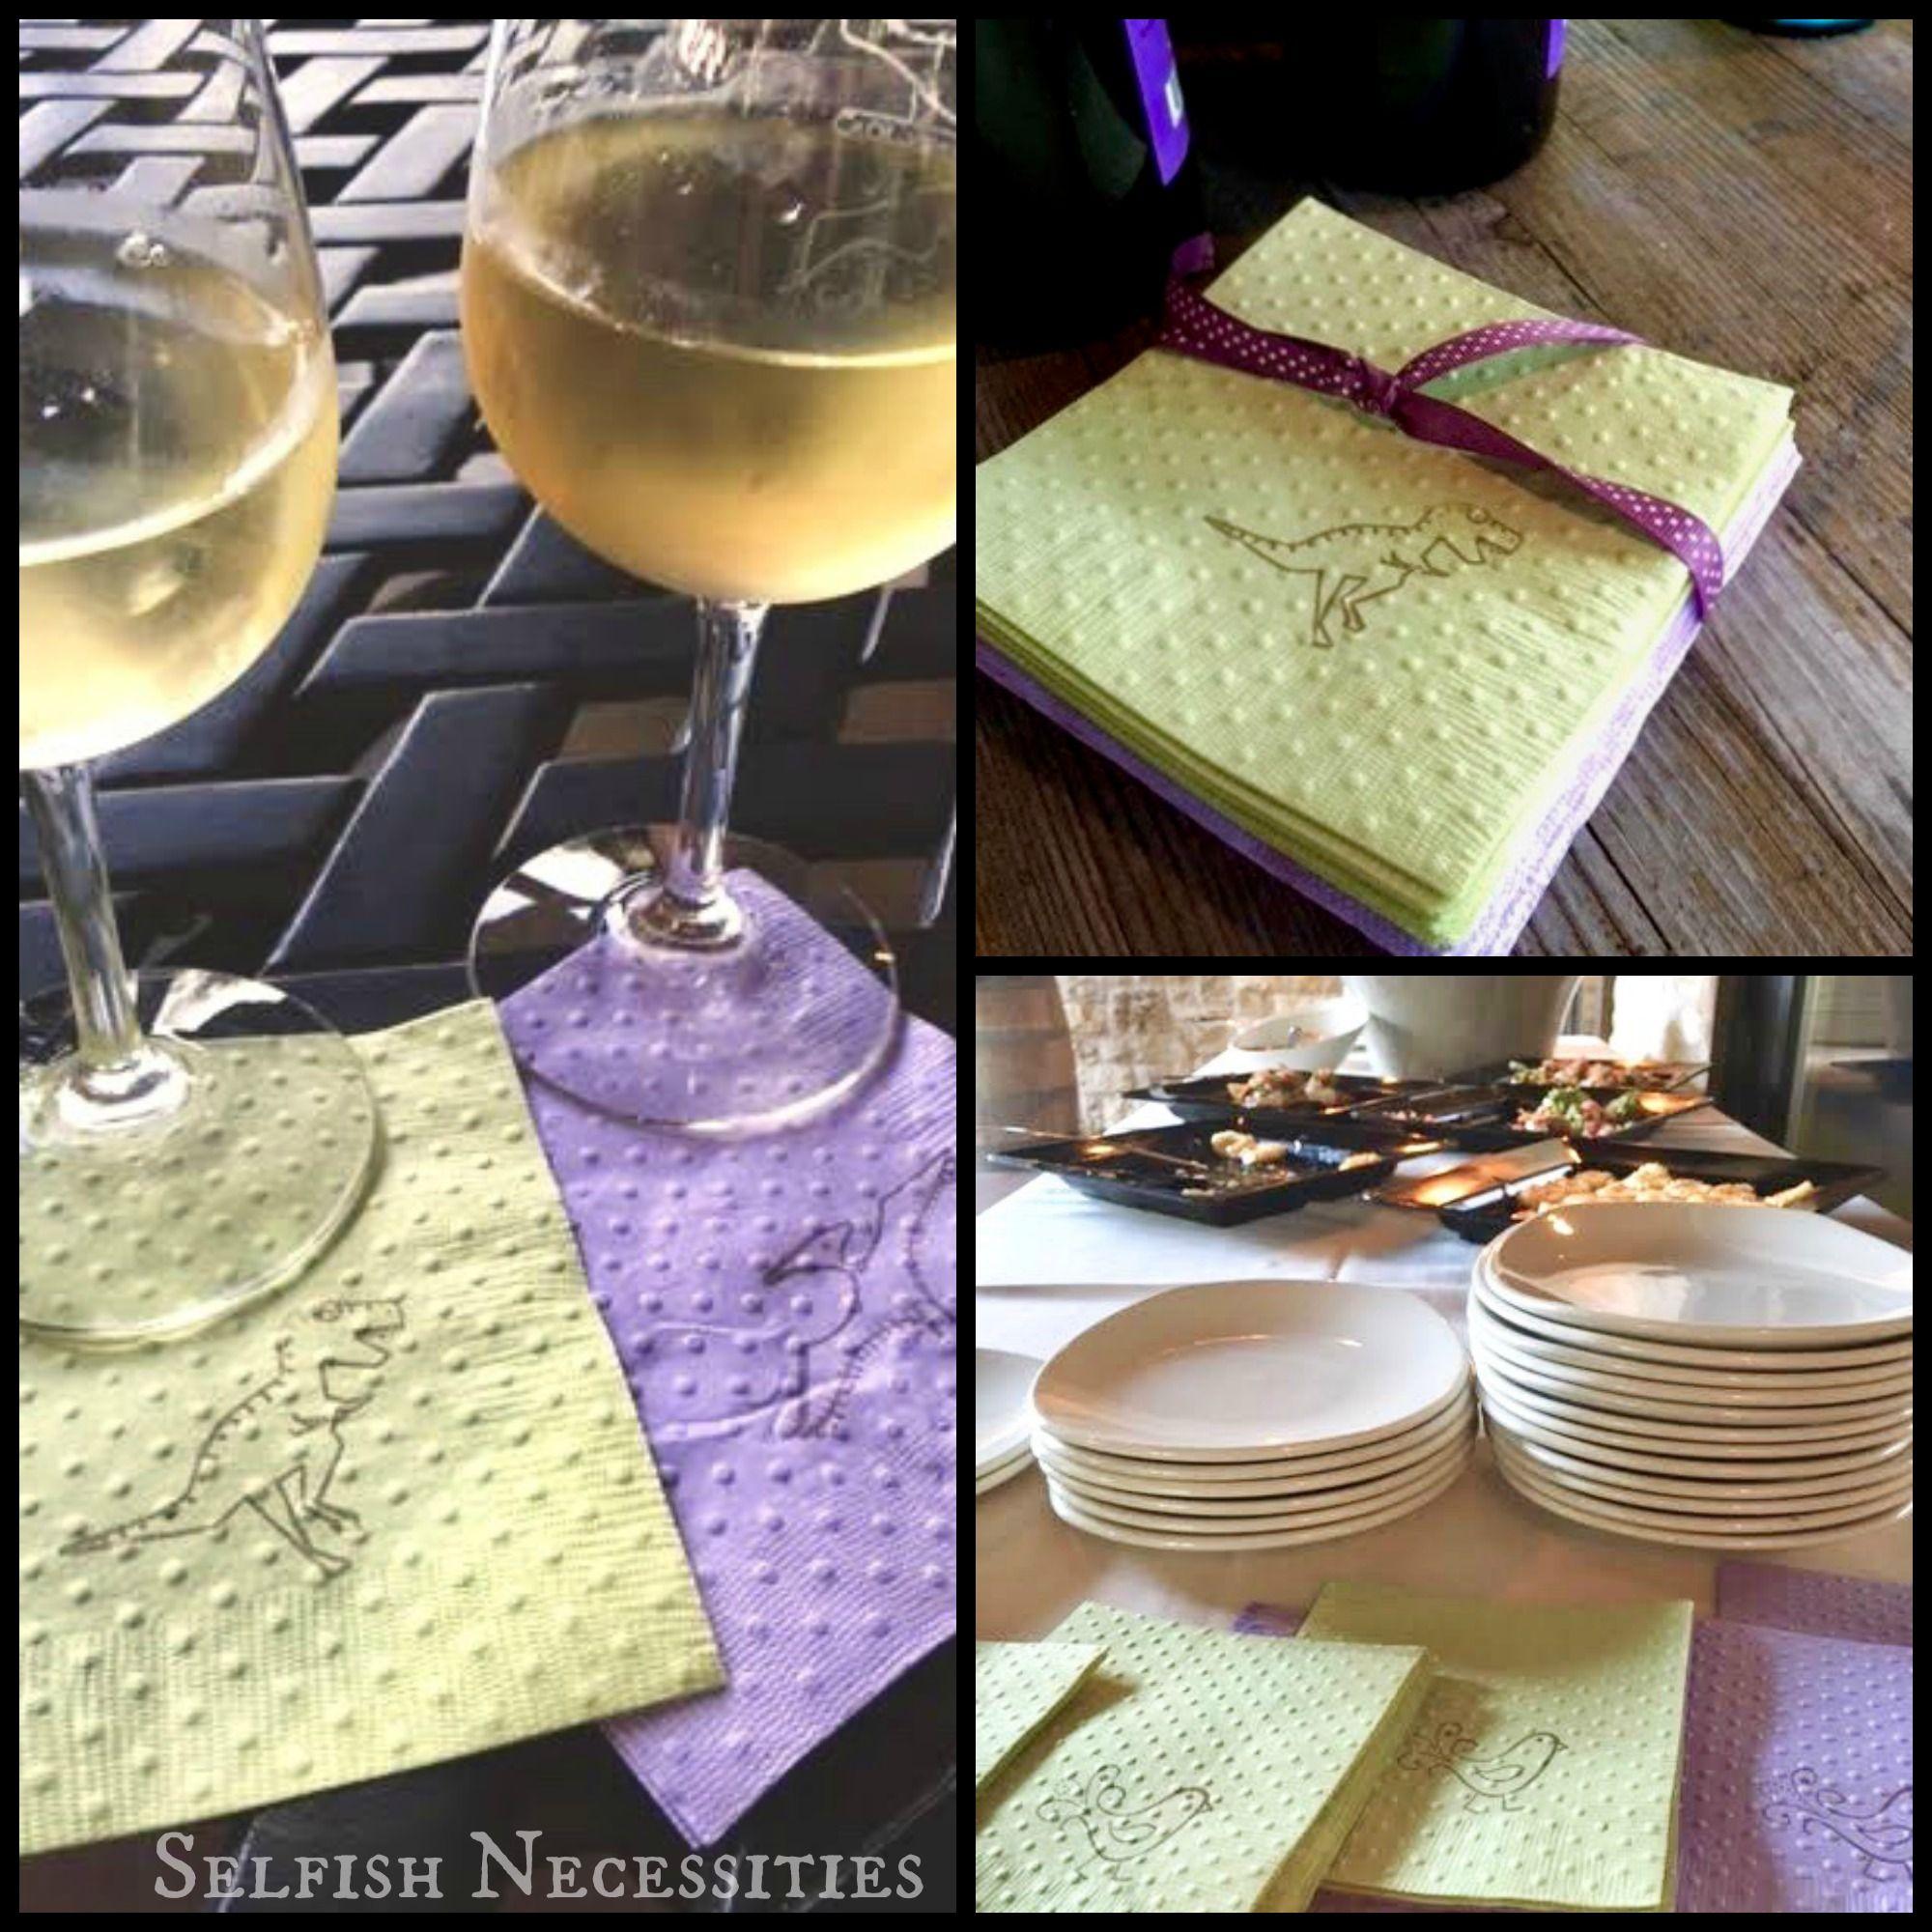 Winery Wedding Reception A Selfish Necessities Client Featuring Dinosaur And Bird Napkins